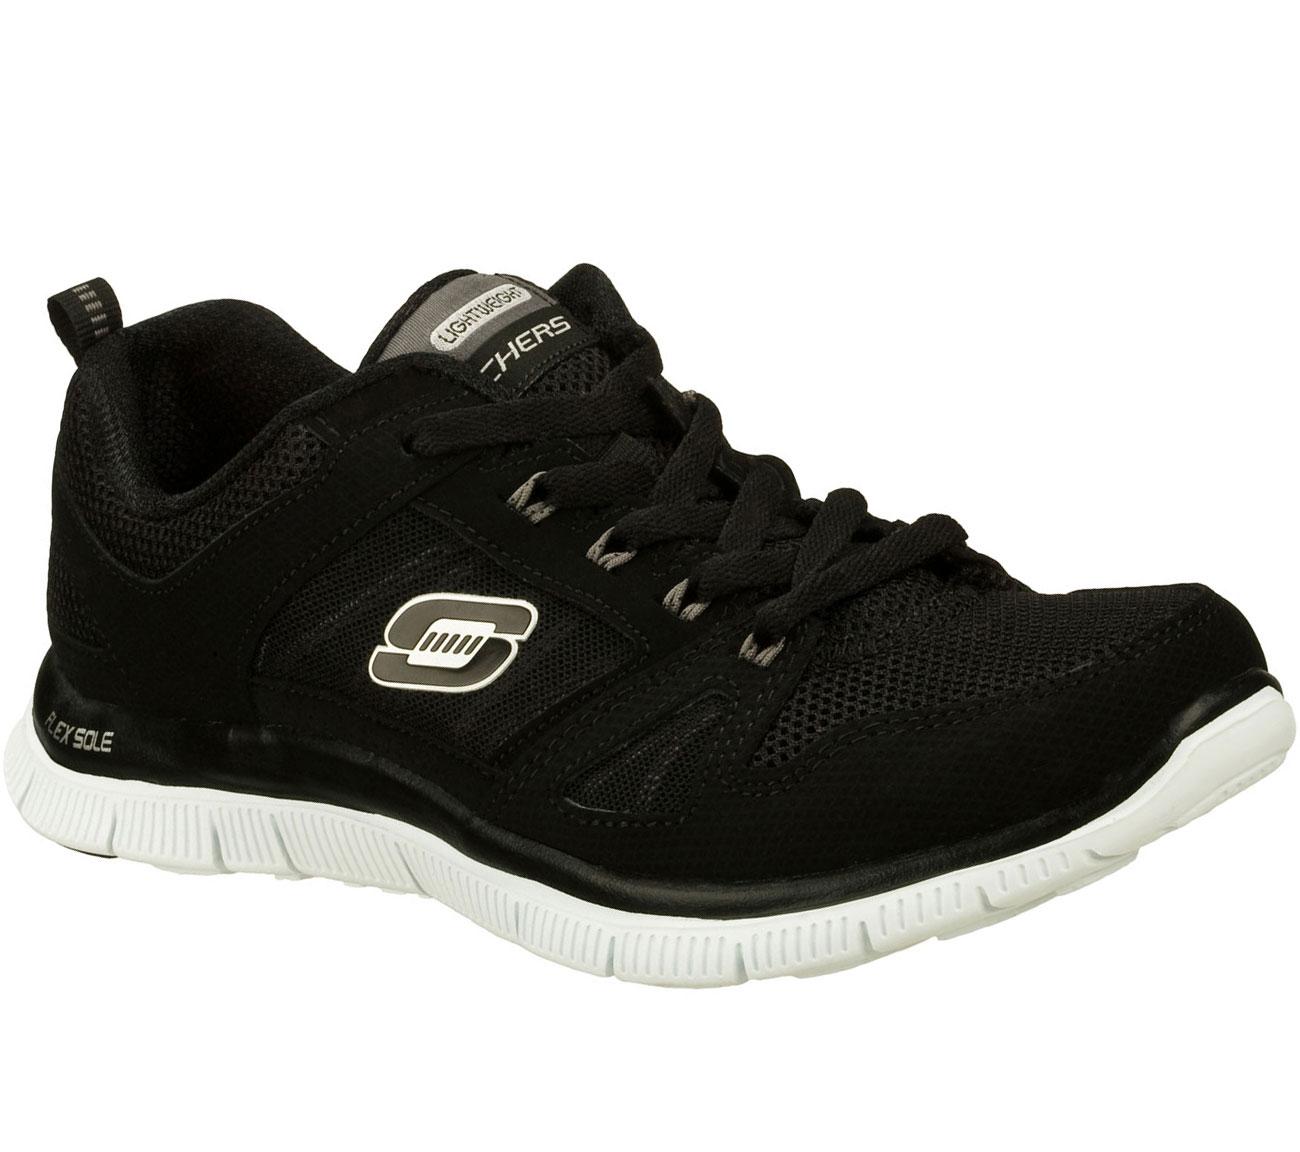 SKECHERS Women's Sweetpea Sneakers & Athletic Shoes | Fashionssneakers